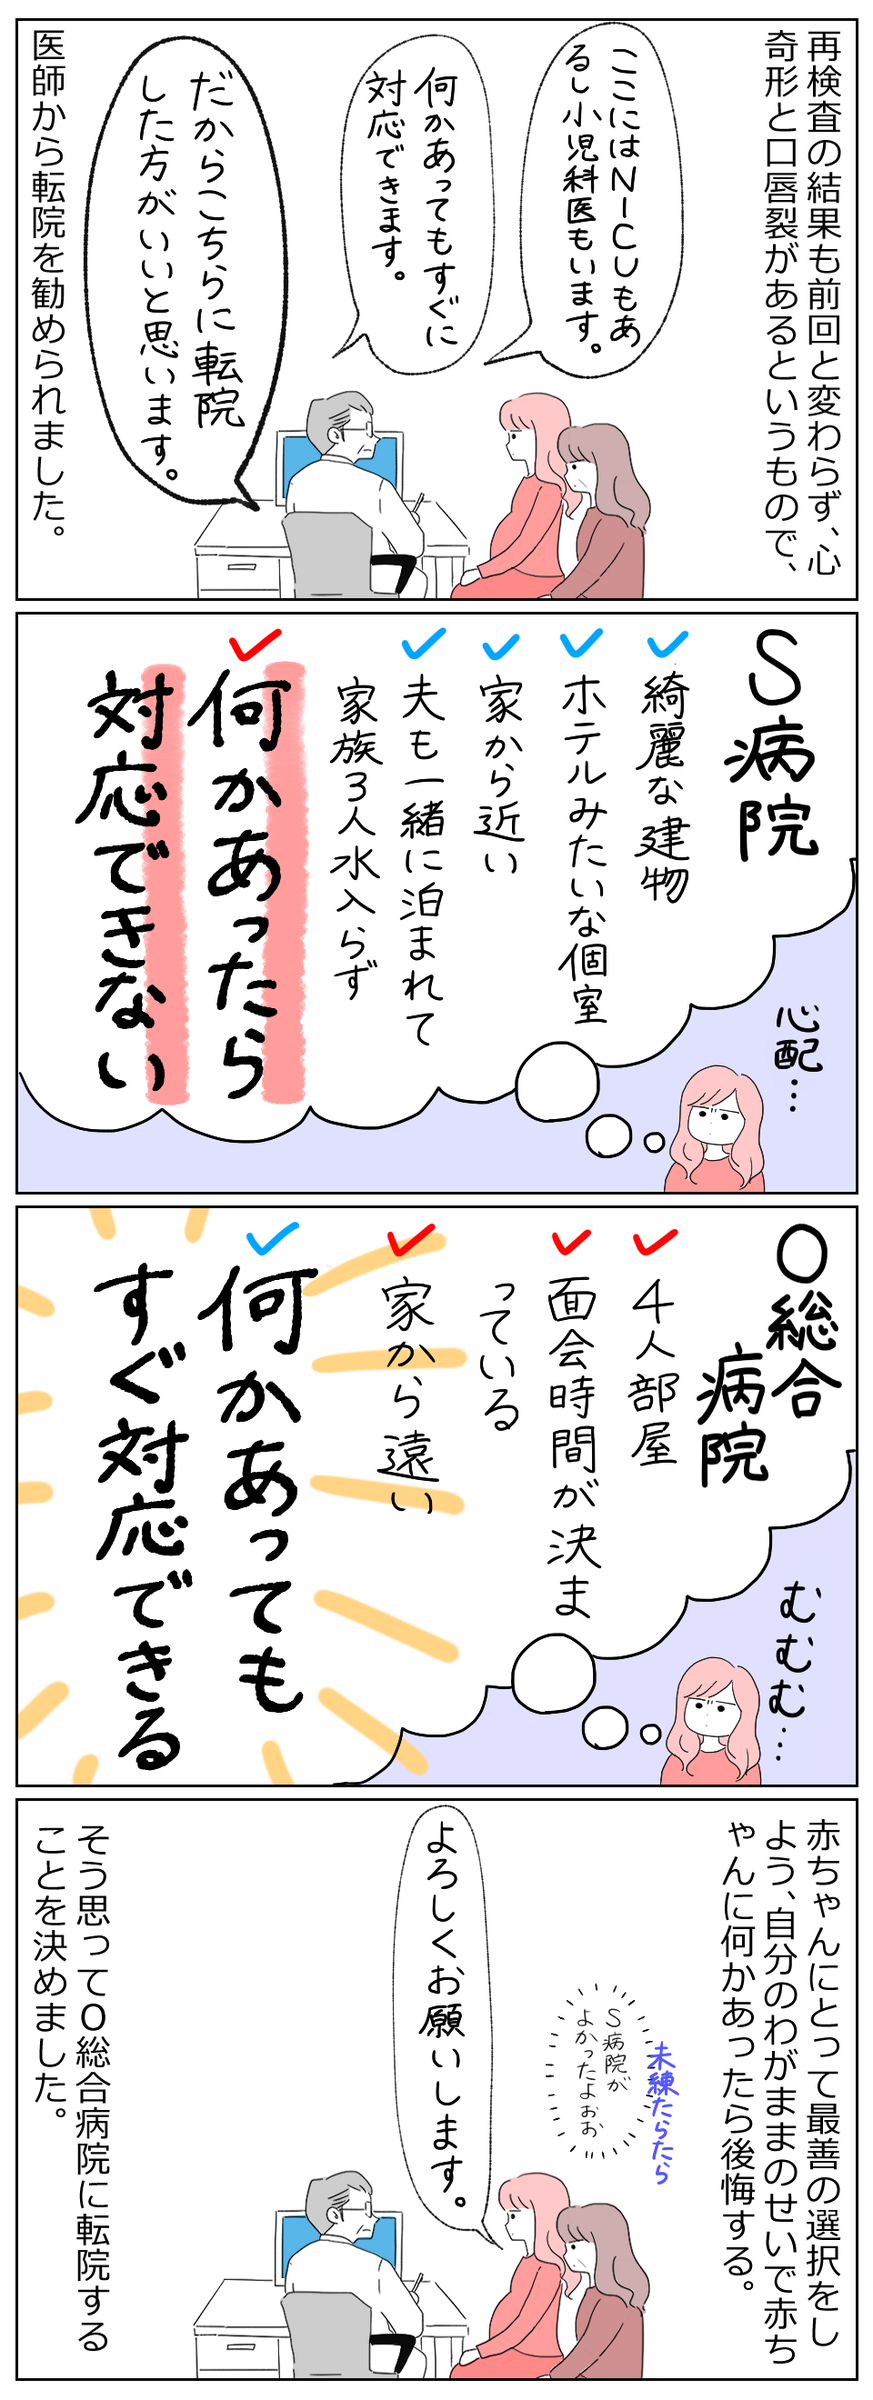 f:id:kayarimo:20190315220520j:plain